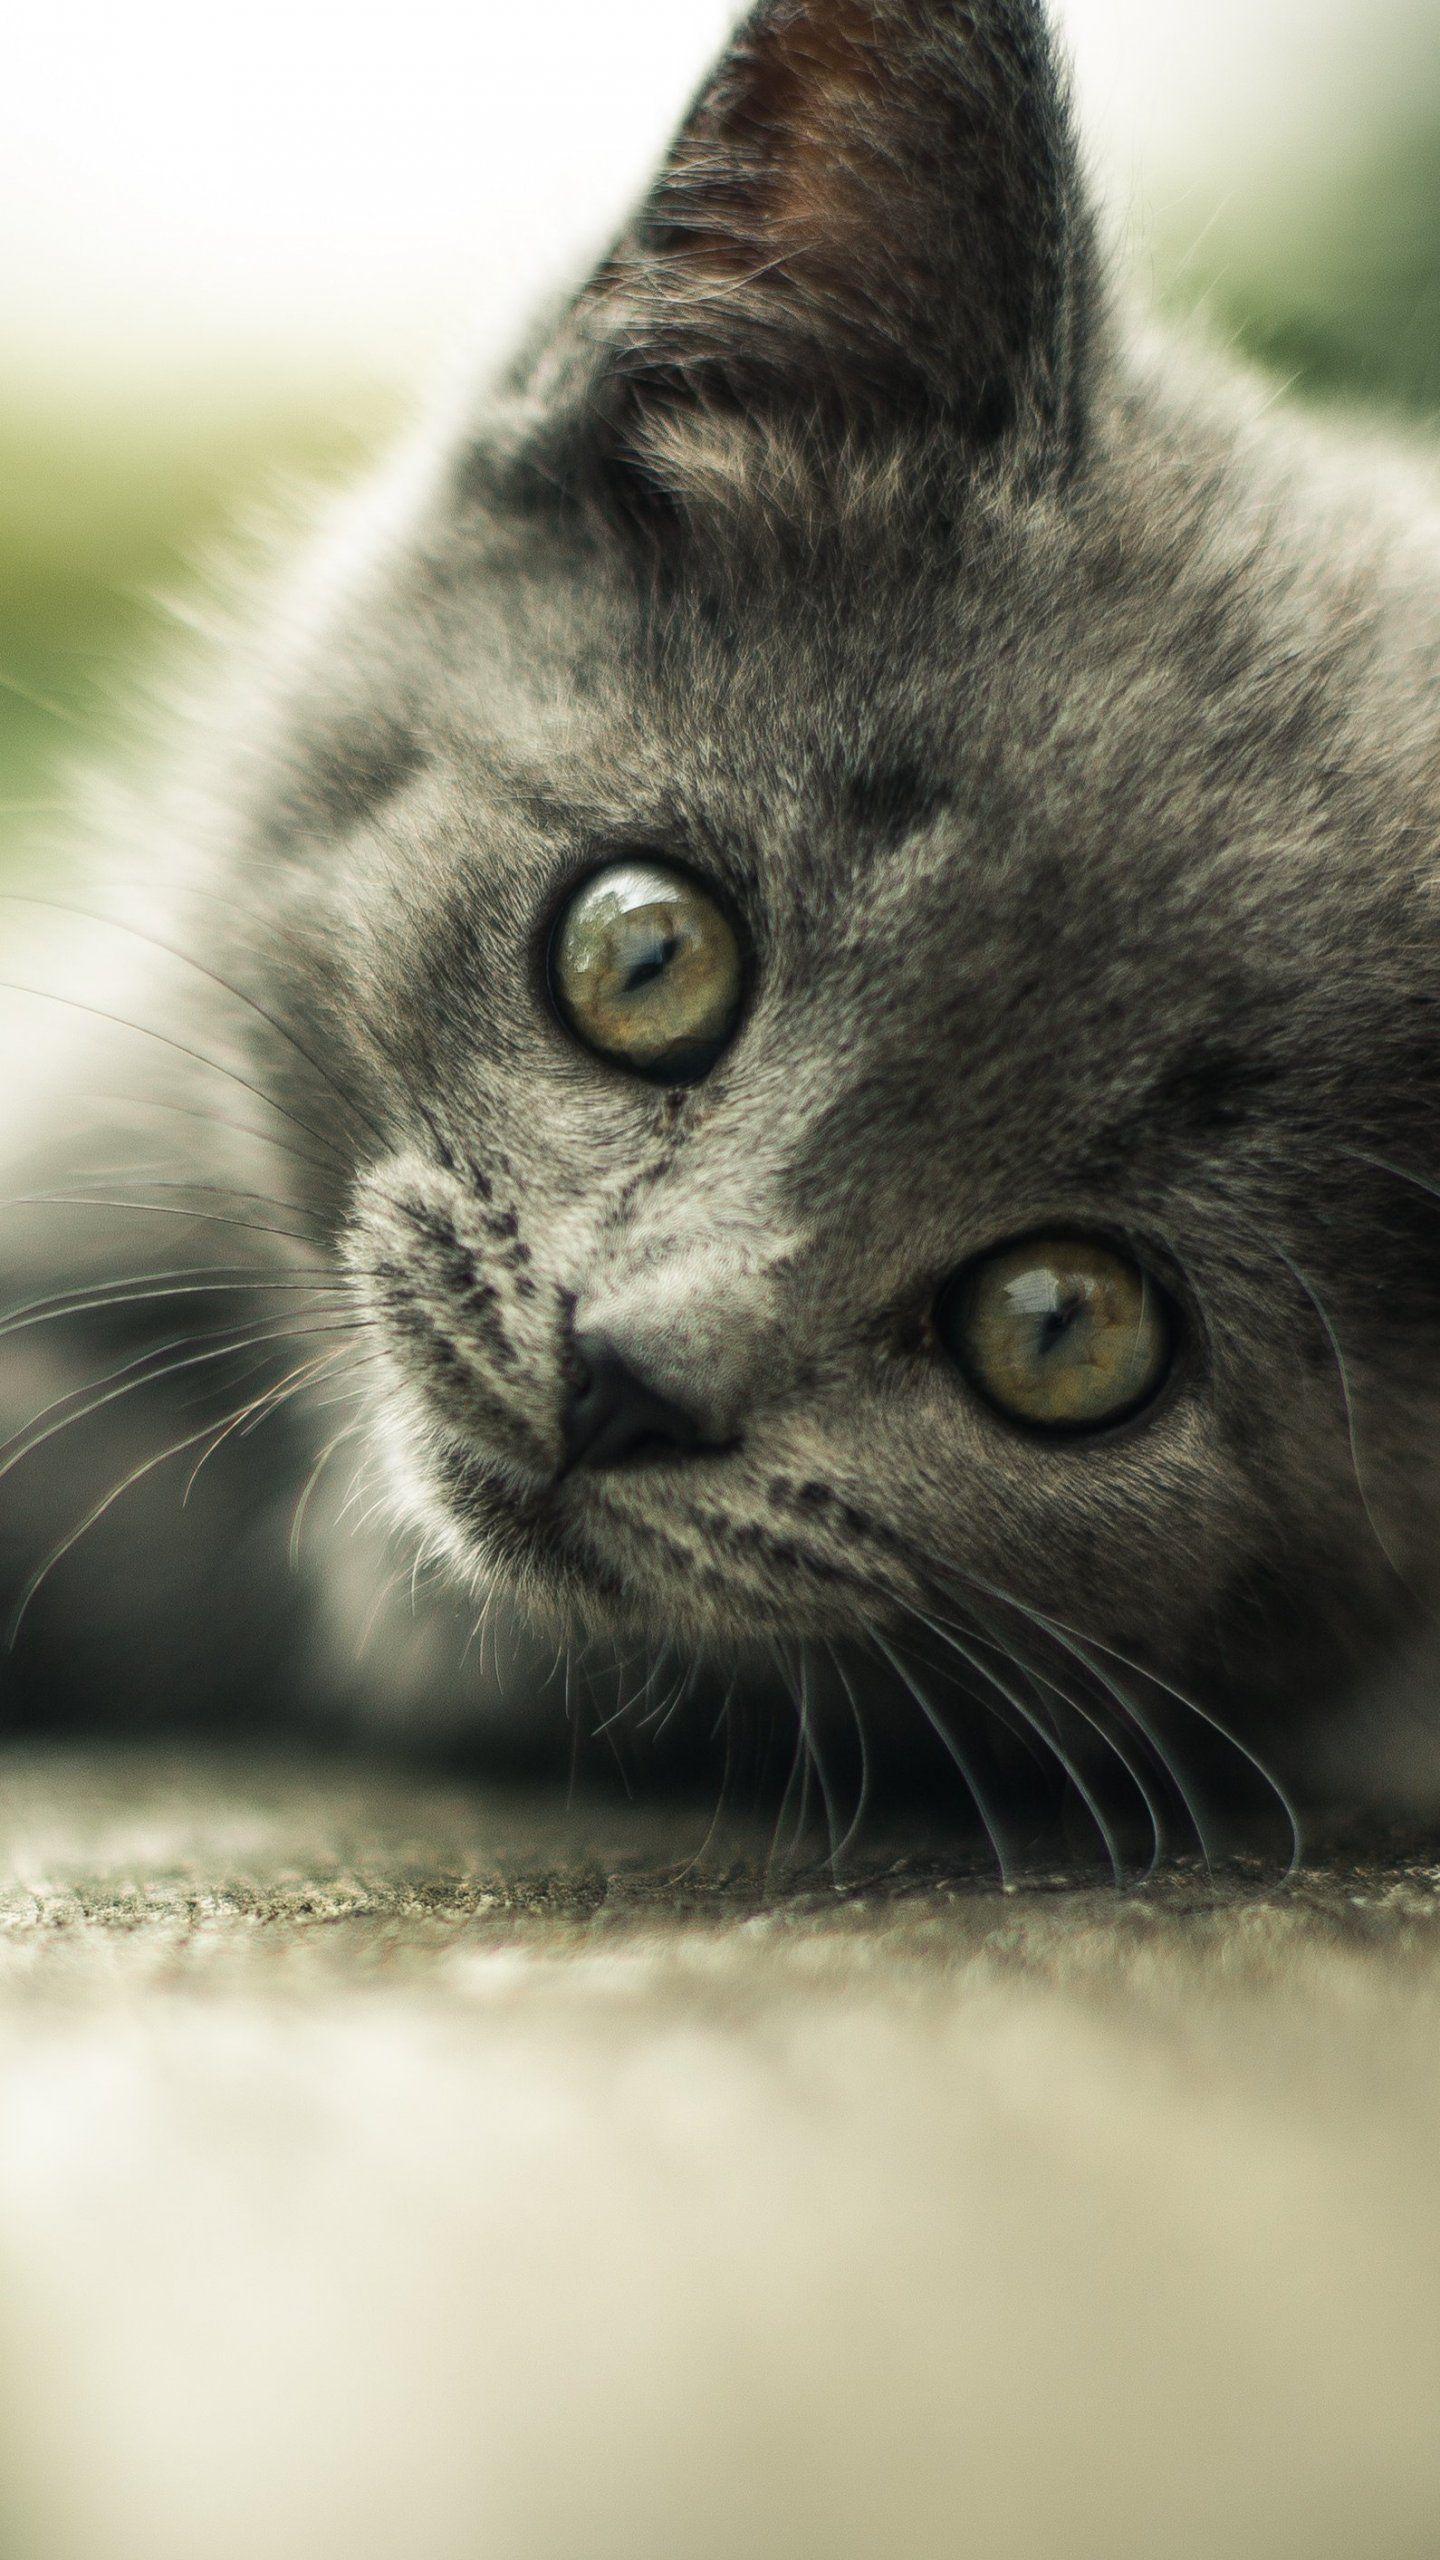 Gray Kitten Wallpaper Iphone Android Desktop Backgrounds Grey Kitten Cat Care Cats